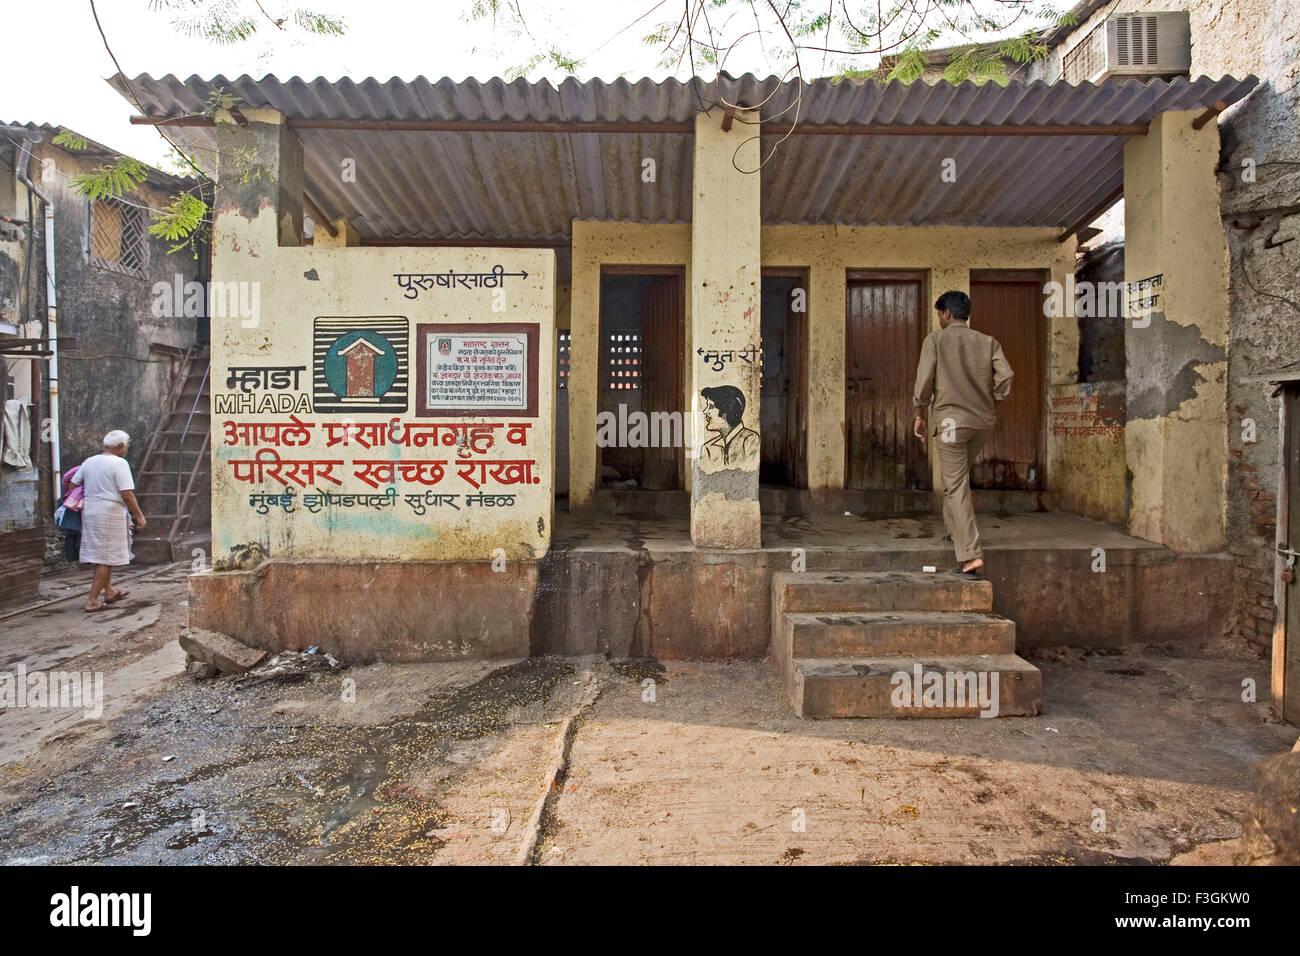 Public toilets for gents in a slum in unhygienic condition ; slum Khotwadi ; Santacruz ; Bombay now Mumbai ; Maharashtra - Stock Image